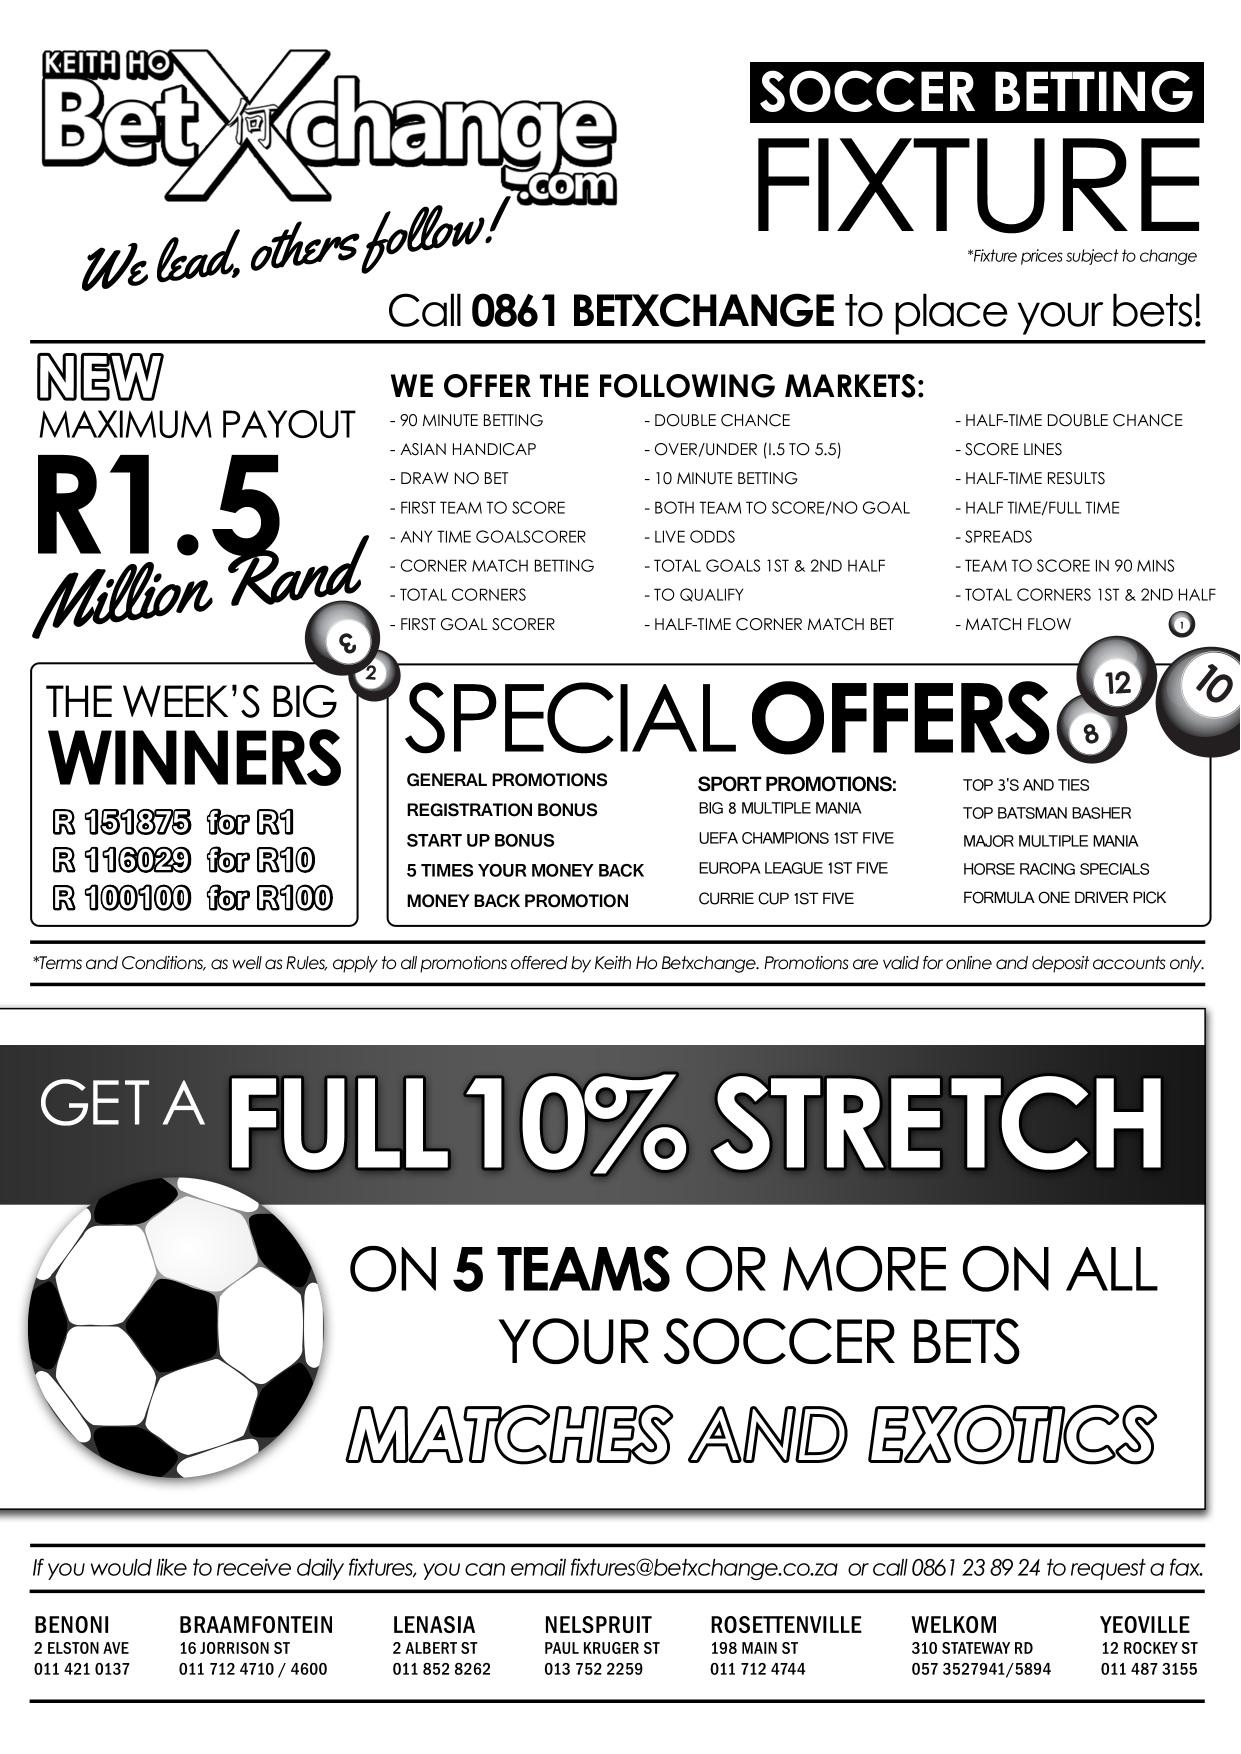 Betting soccer fixture sporting lisbon v braga betting preview